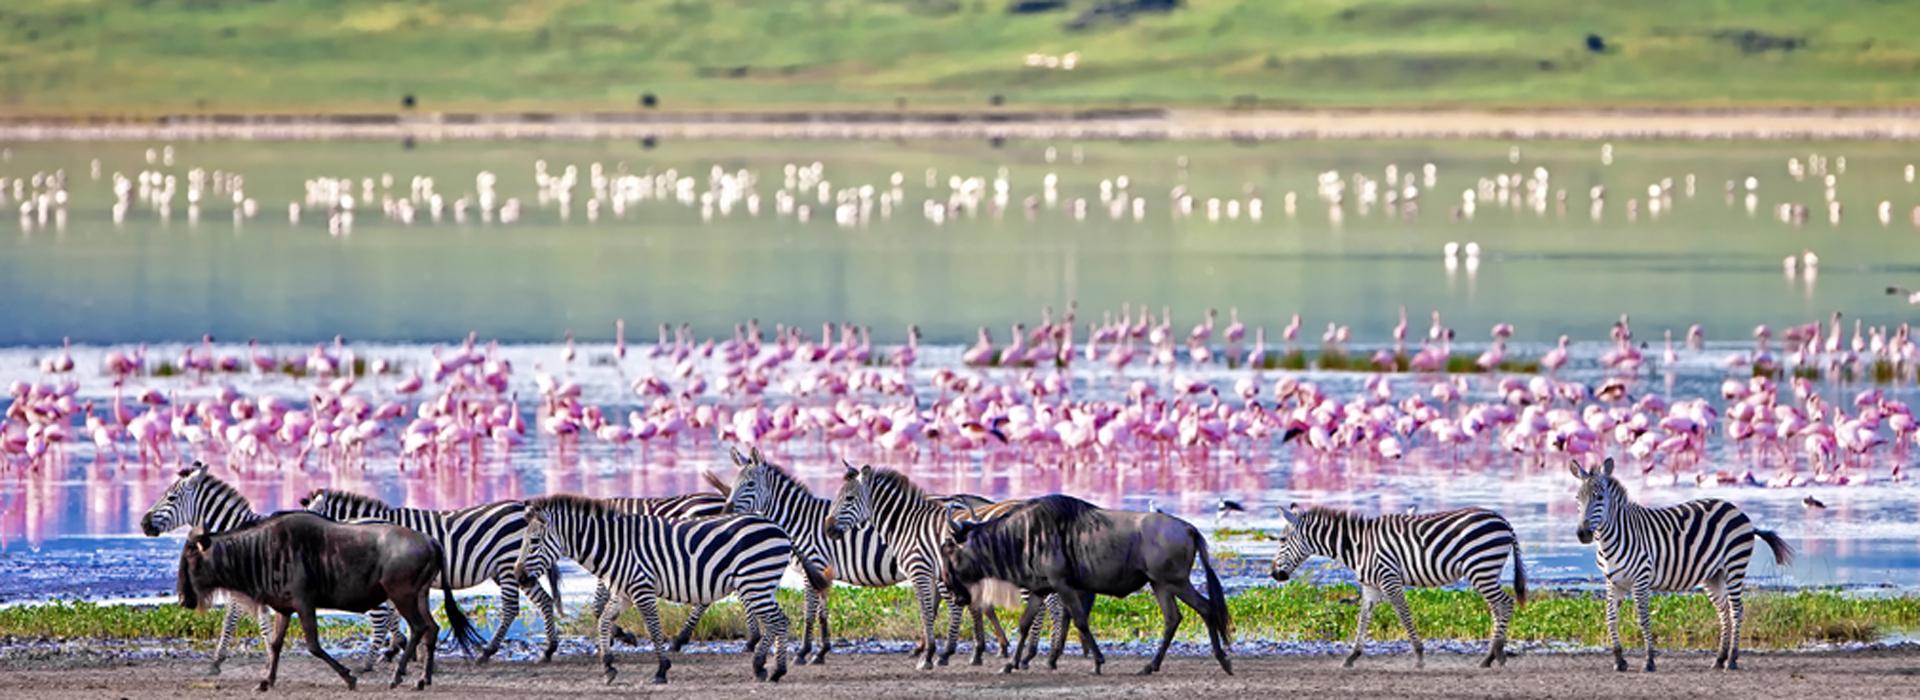 pozza-d'acqua-nel-cratere-ngorongoro